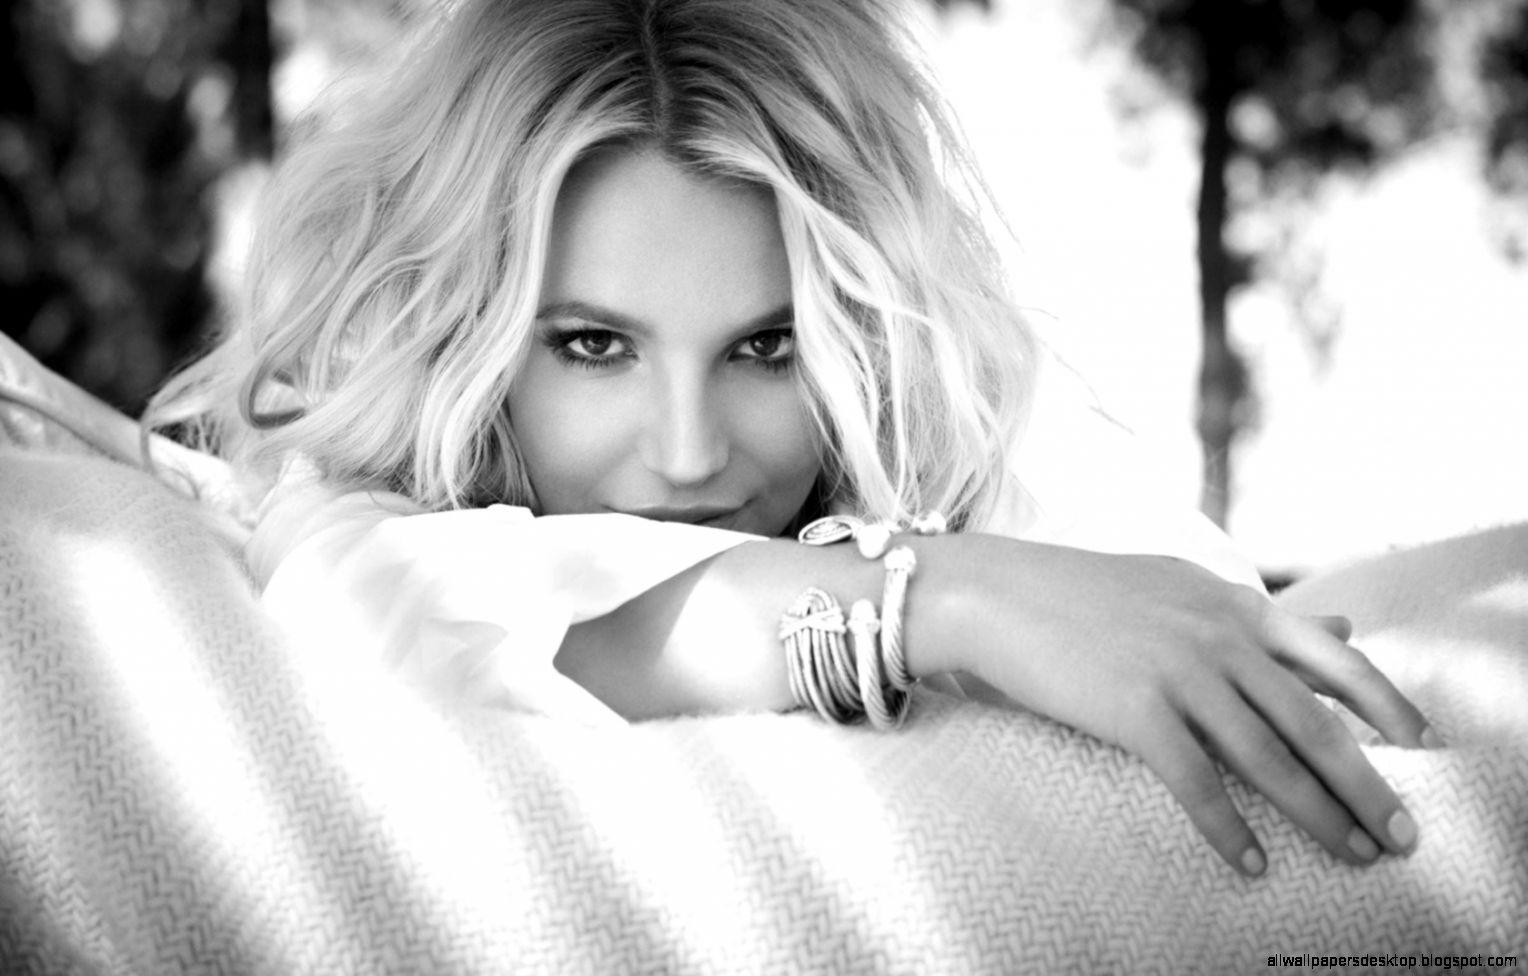 Britney Spears Singer Girl HD Wallpaper   FreeWallsUp